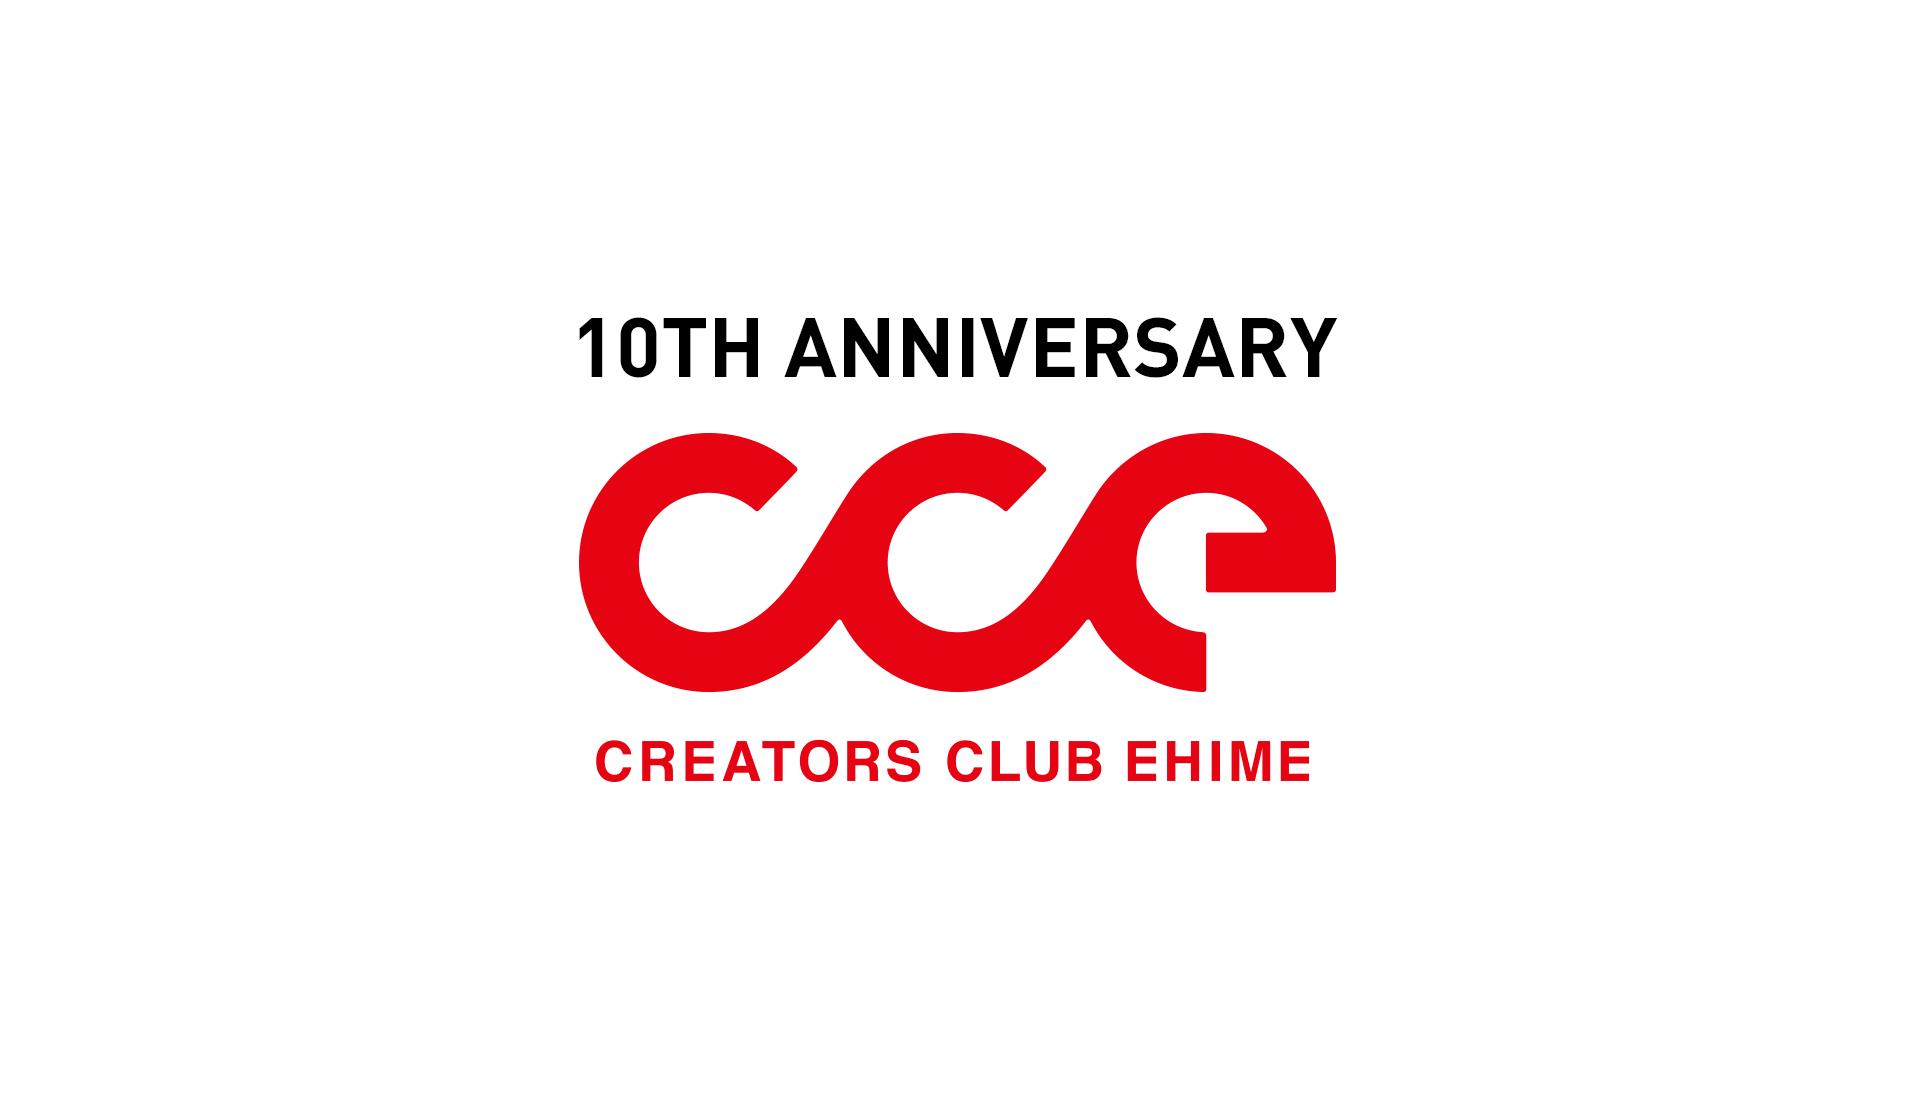 10TH ANNIVERSARY CCE